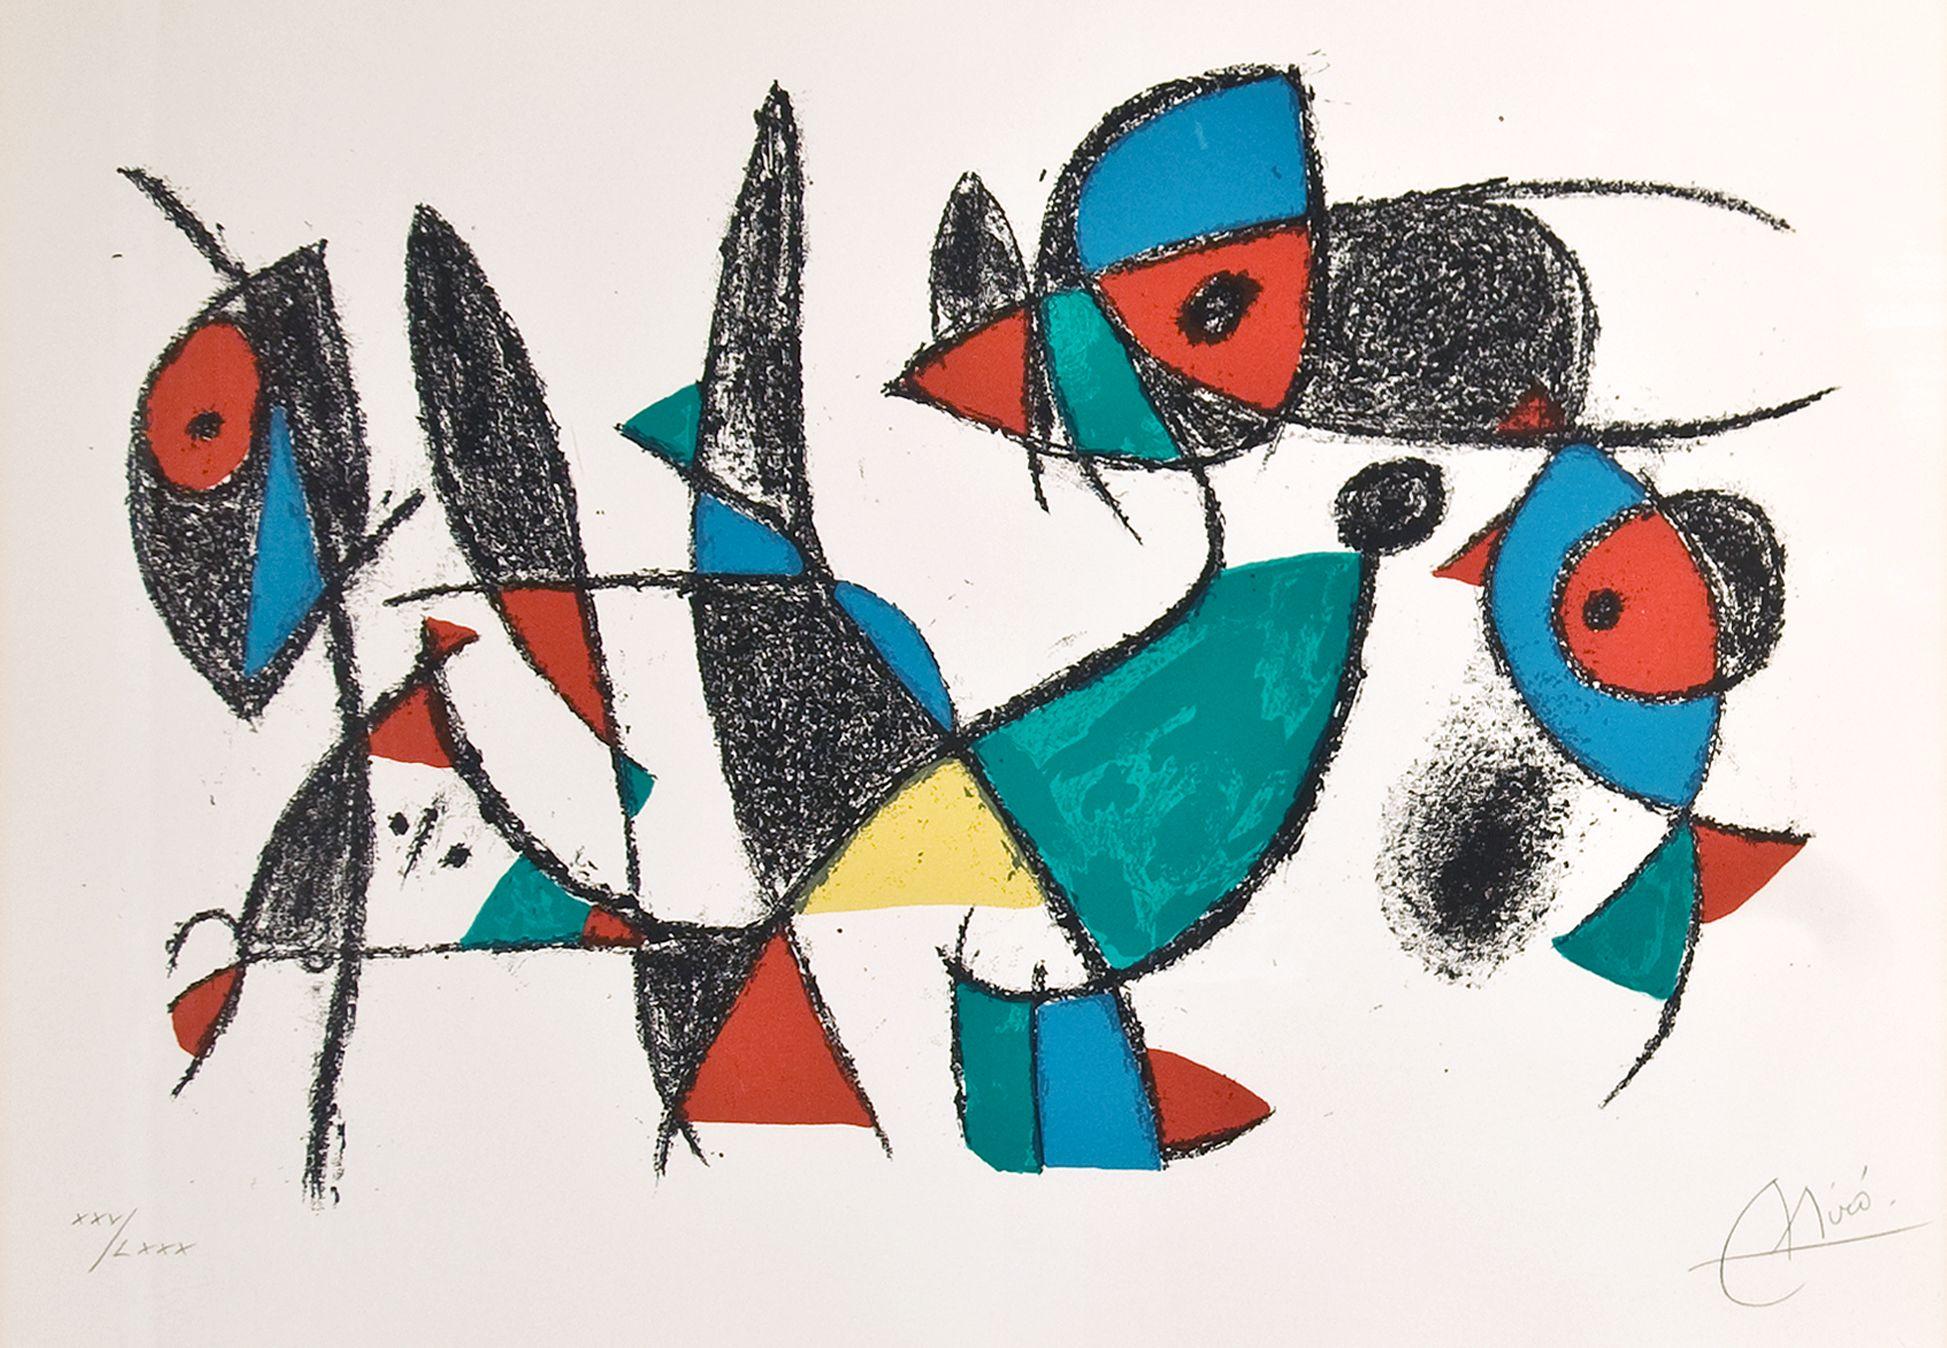 Joan Miró, Litógrafo II, 1975, © Successió Miró  VG Bild-Kunst, Bonn 2017